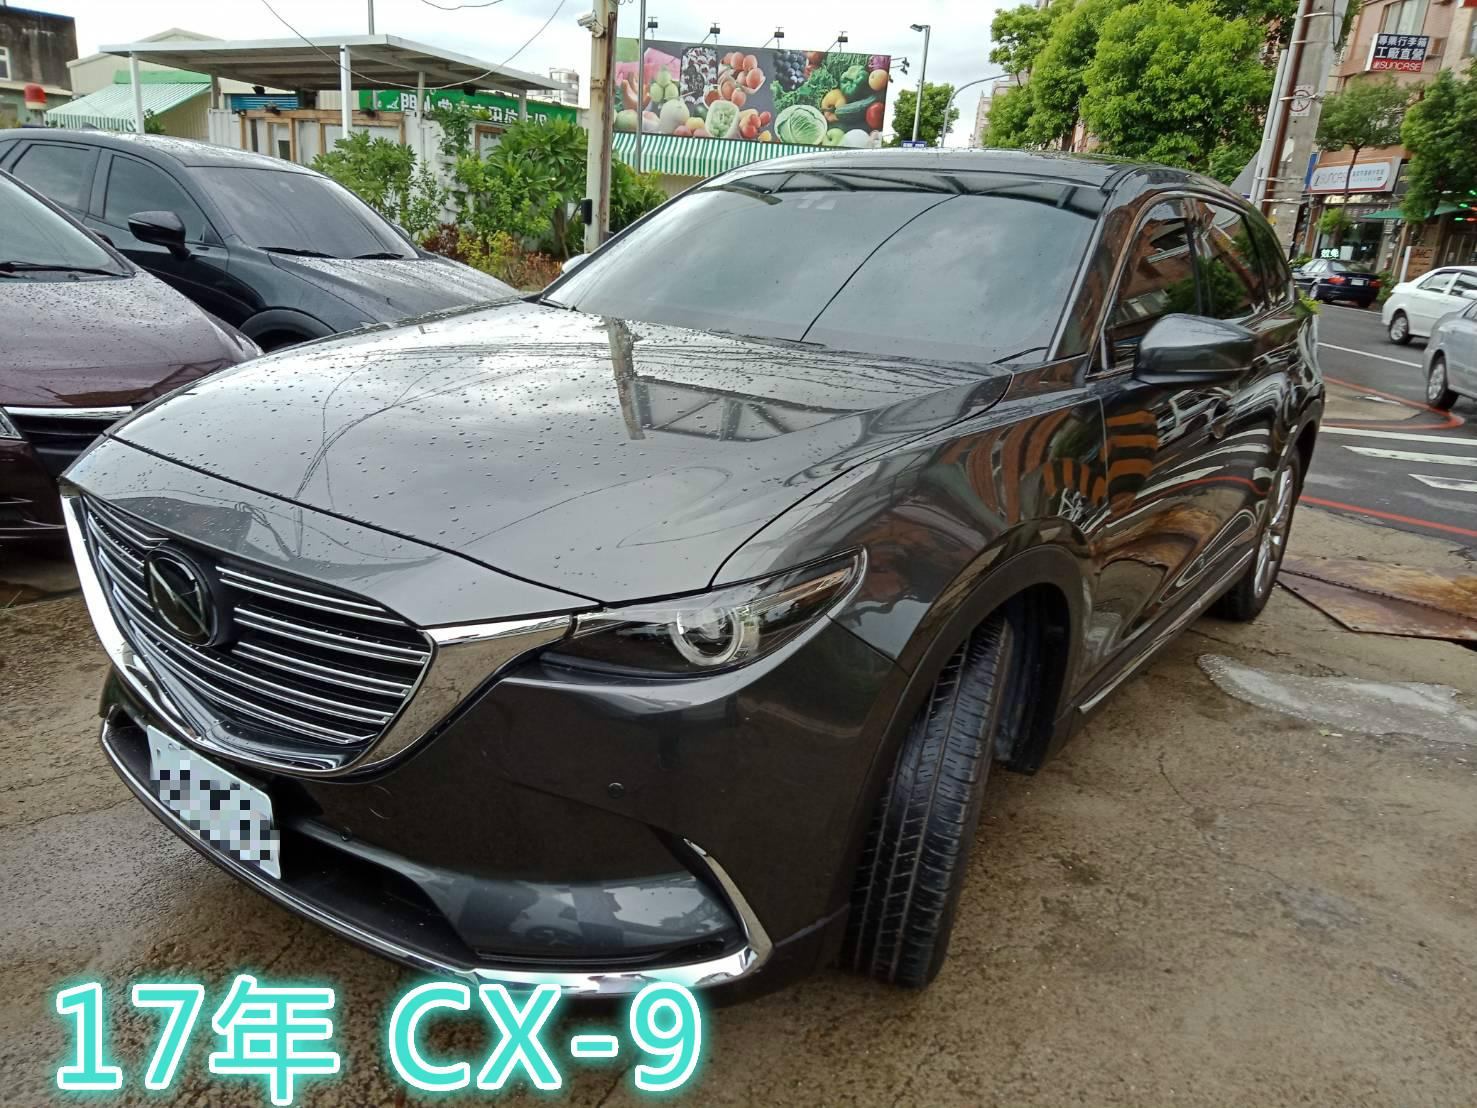 CX-9 AWD 旗艦款 全額貸 低利率 找錢 車換車 皆可辦理